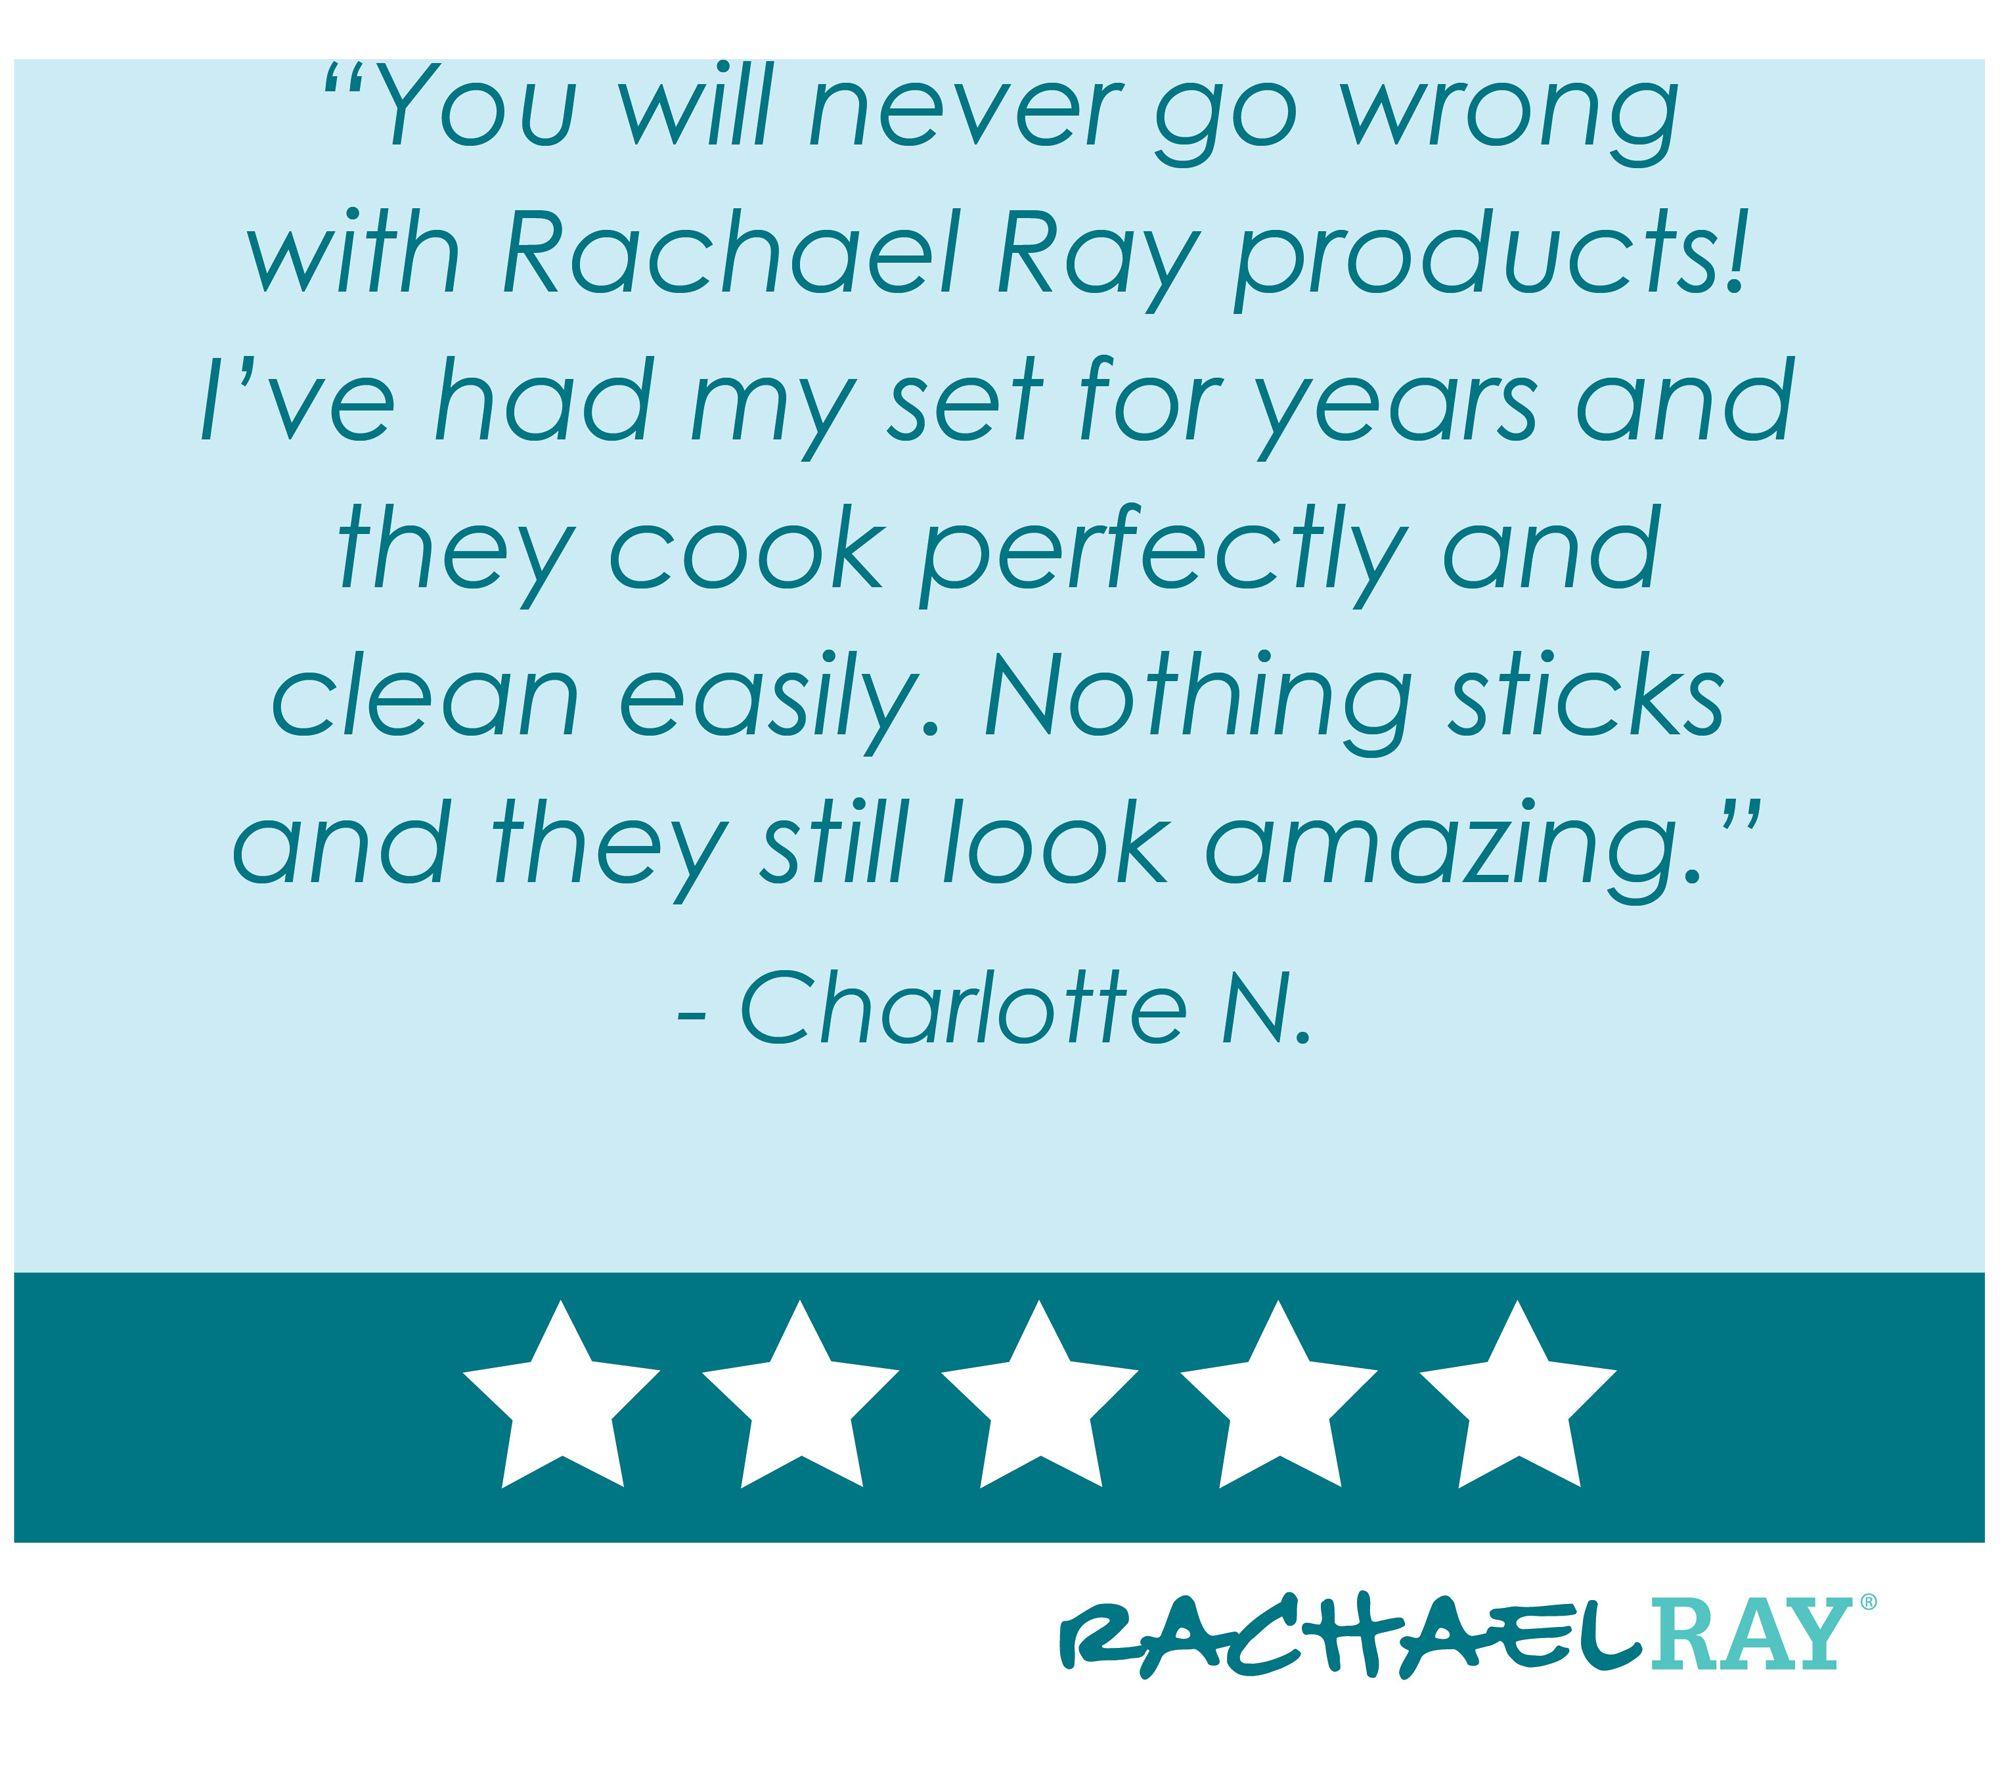 Rachael Ray Cucina Hard Enamel 12-Piece Cookware Set - Page 1 — QVC.com